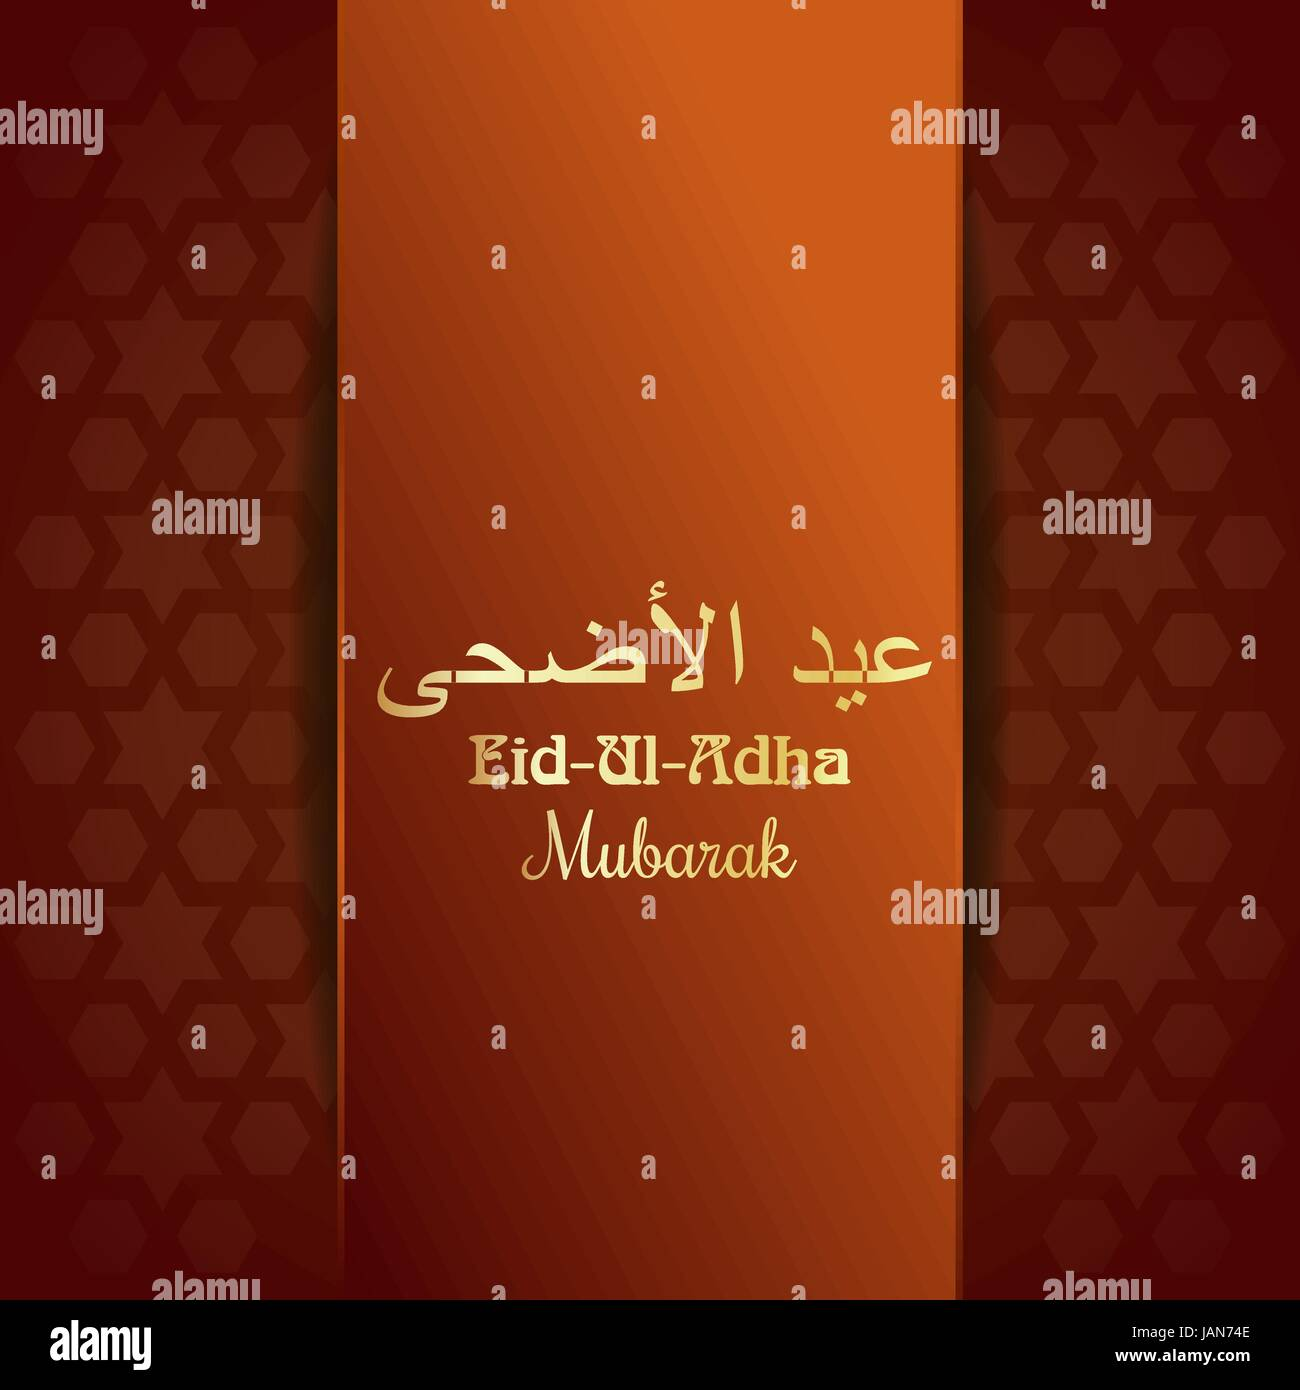 Eid Ul Adha Mubarak Greeting Card Islamic Design Stock Vector Art